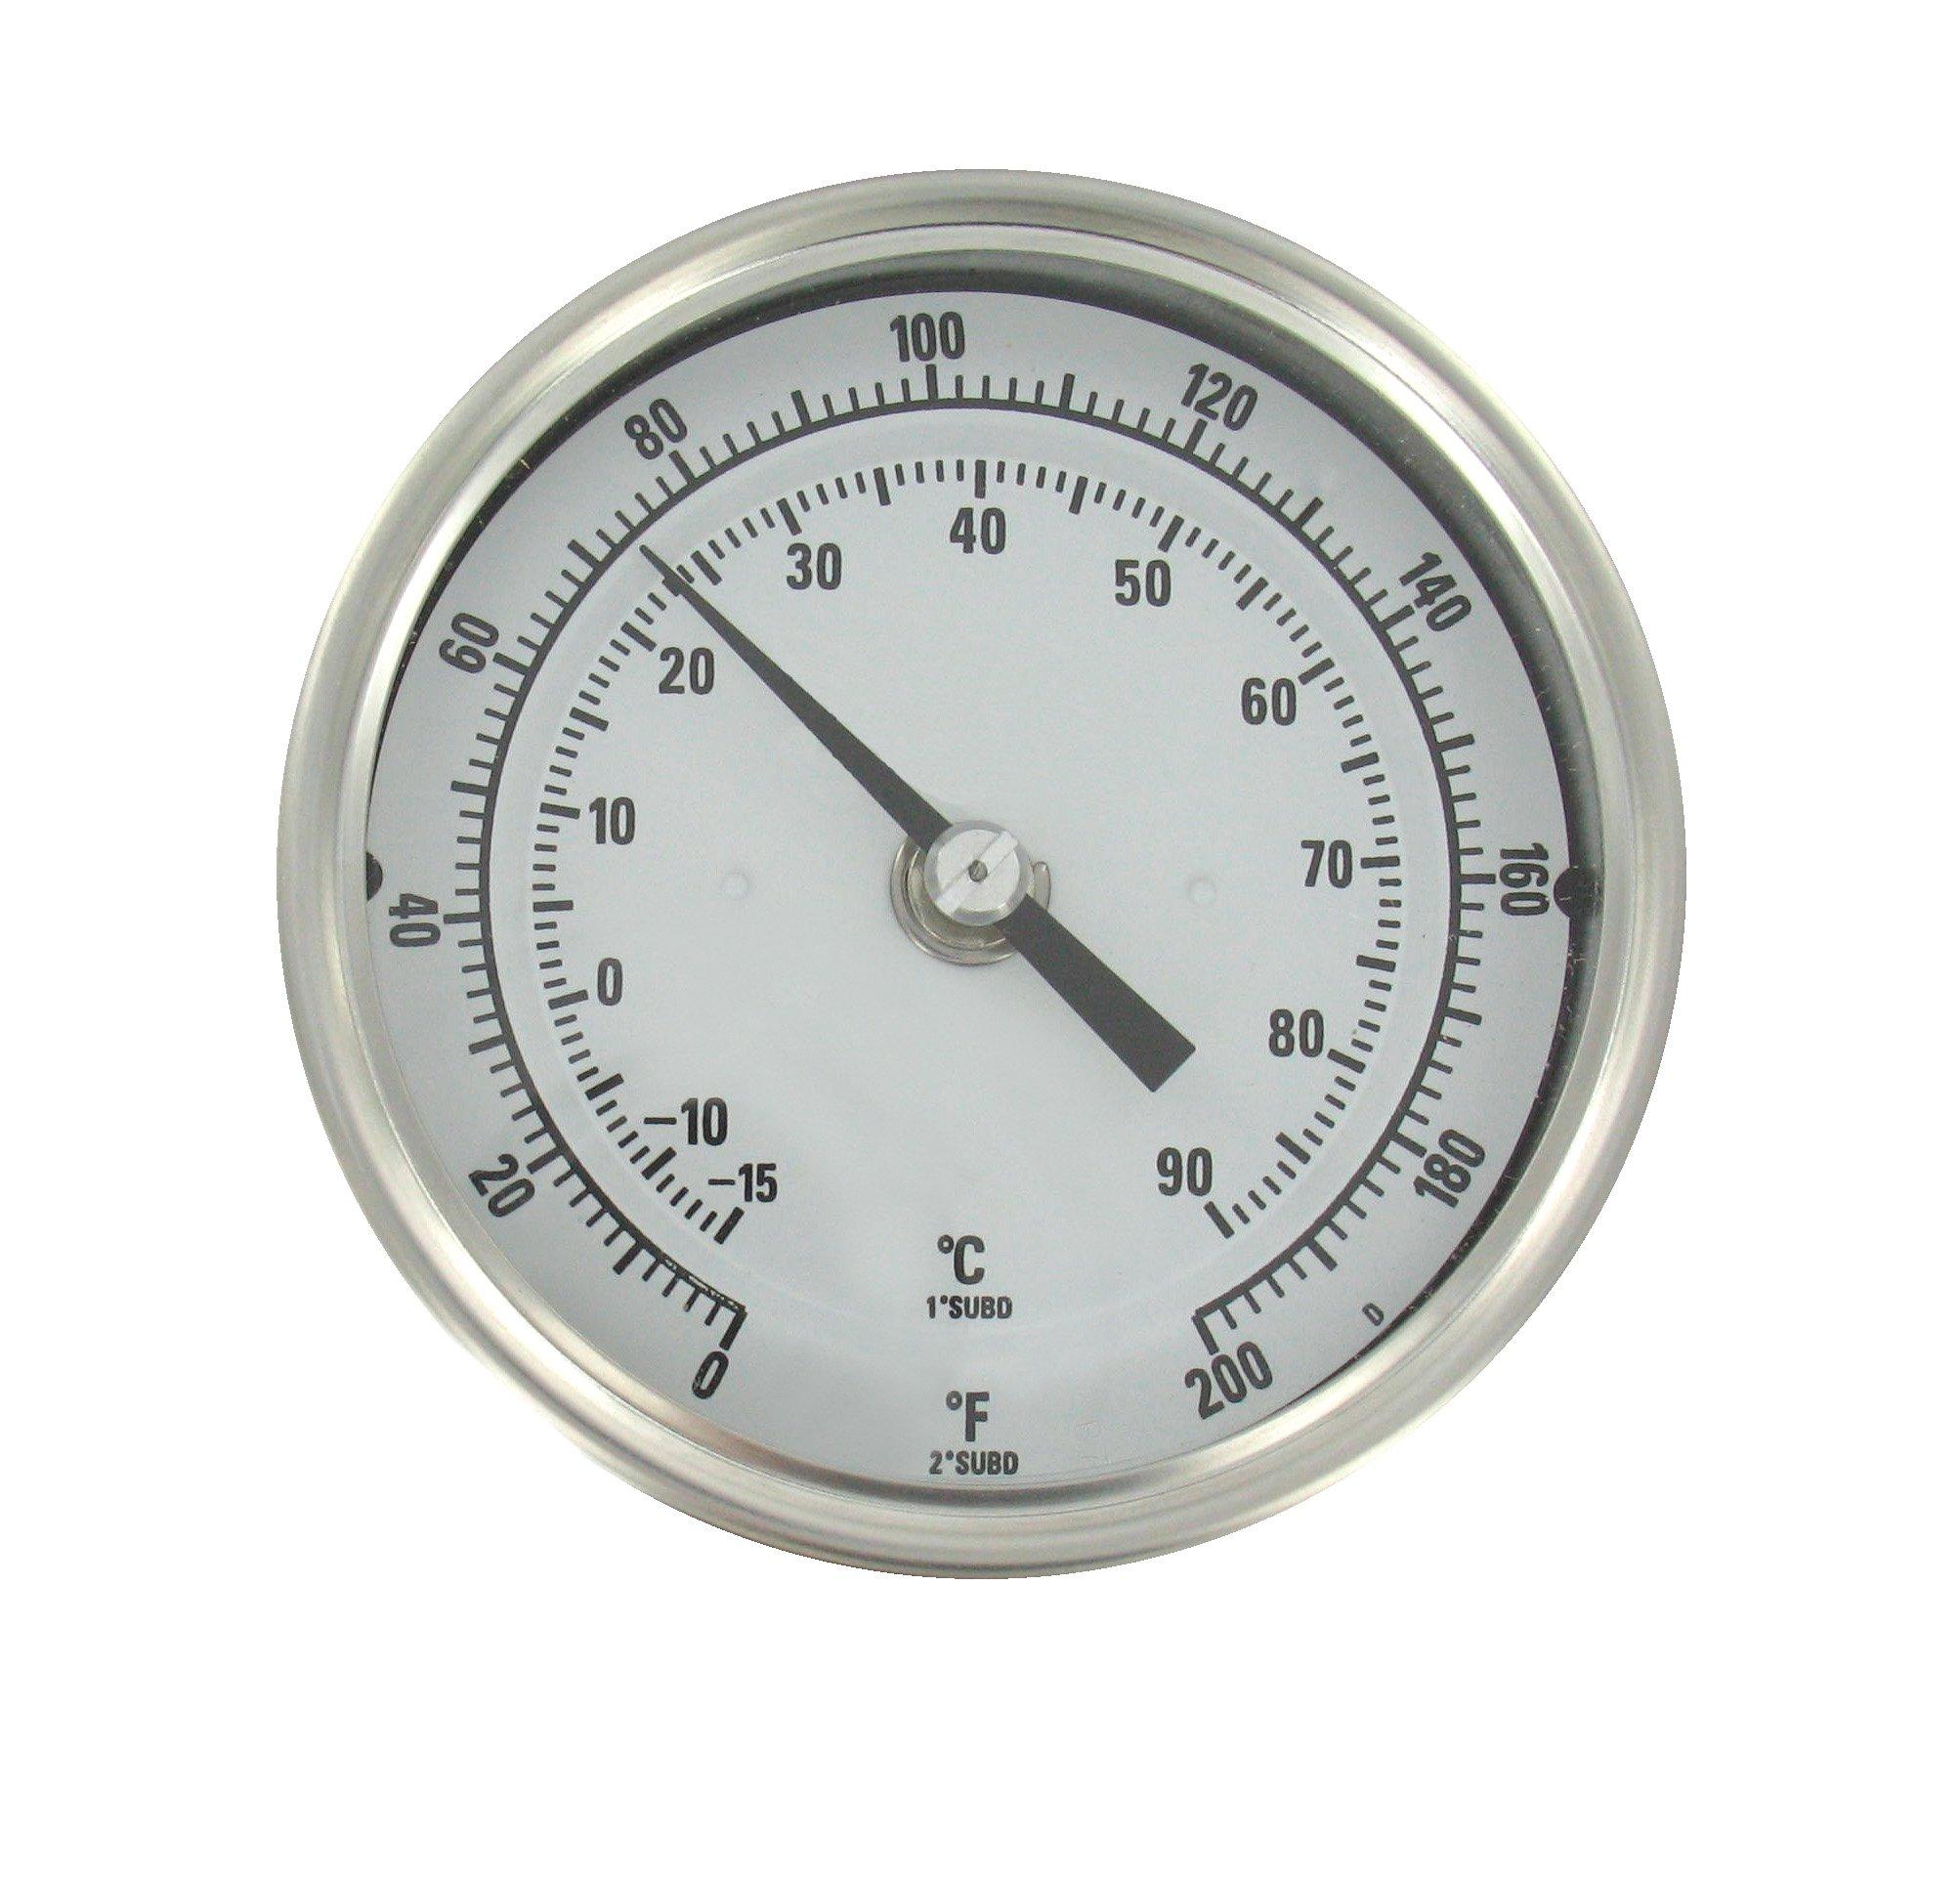 Dwyer® Long Reach Bimetal Thermometer, BTLRN348101, 0-200°F, 48'' Stem